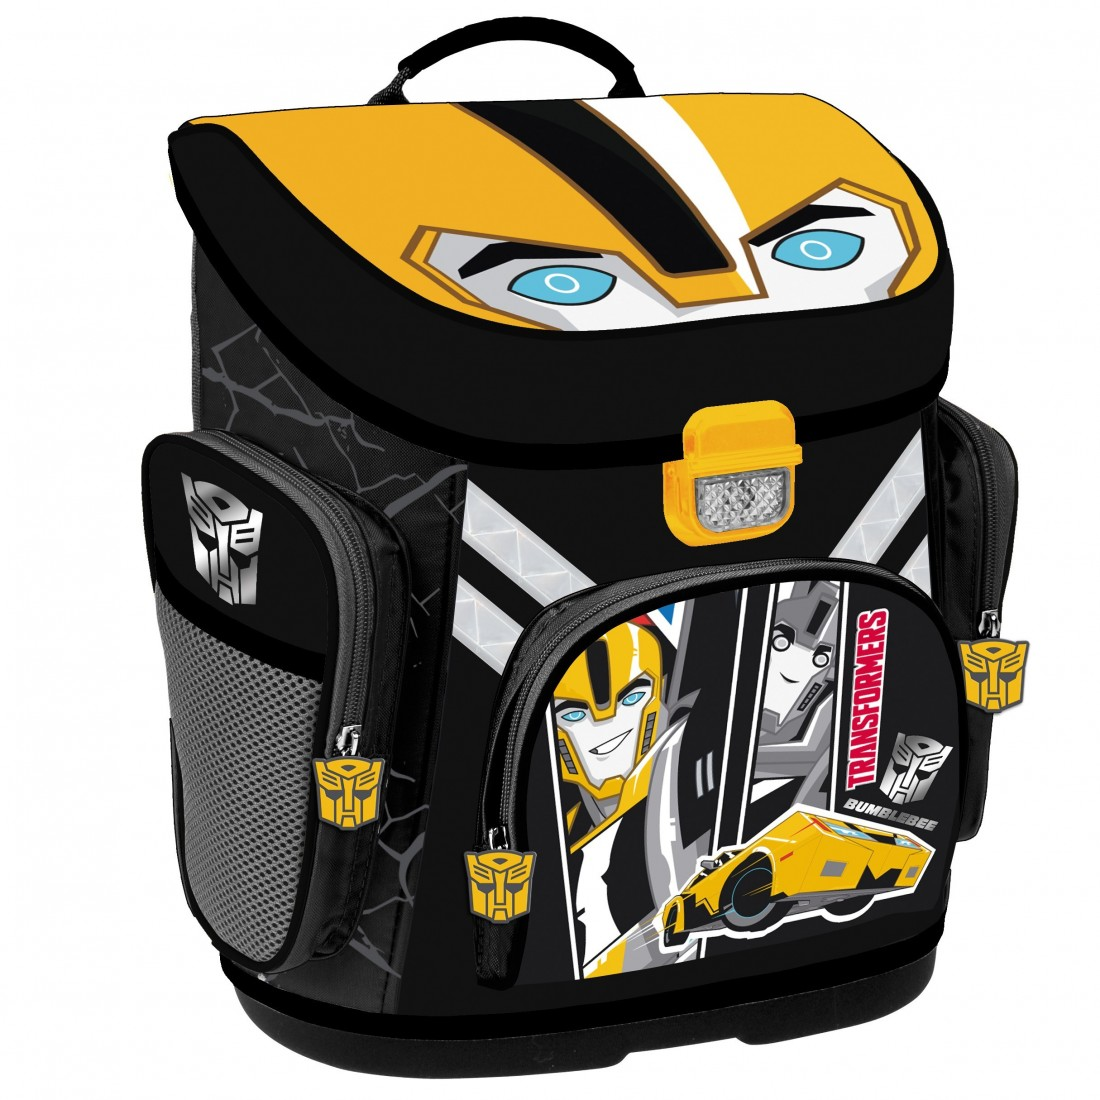 ZESTAW Tornister Szkolny Transformers Bumblebee Supermocni - plecak-tornister.pl